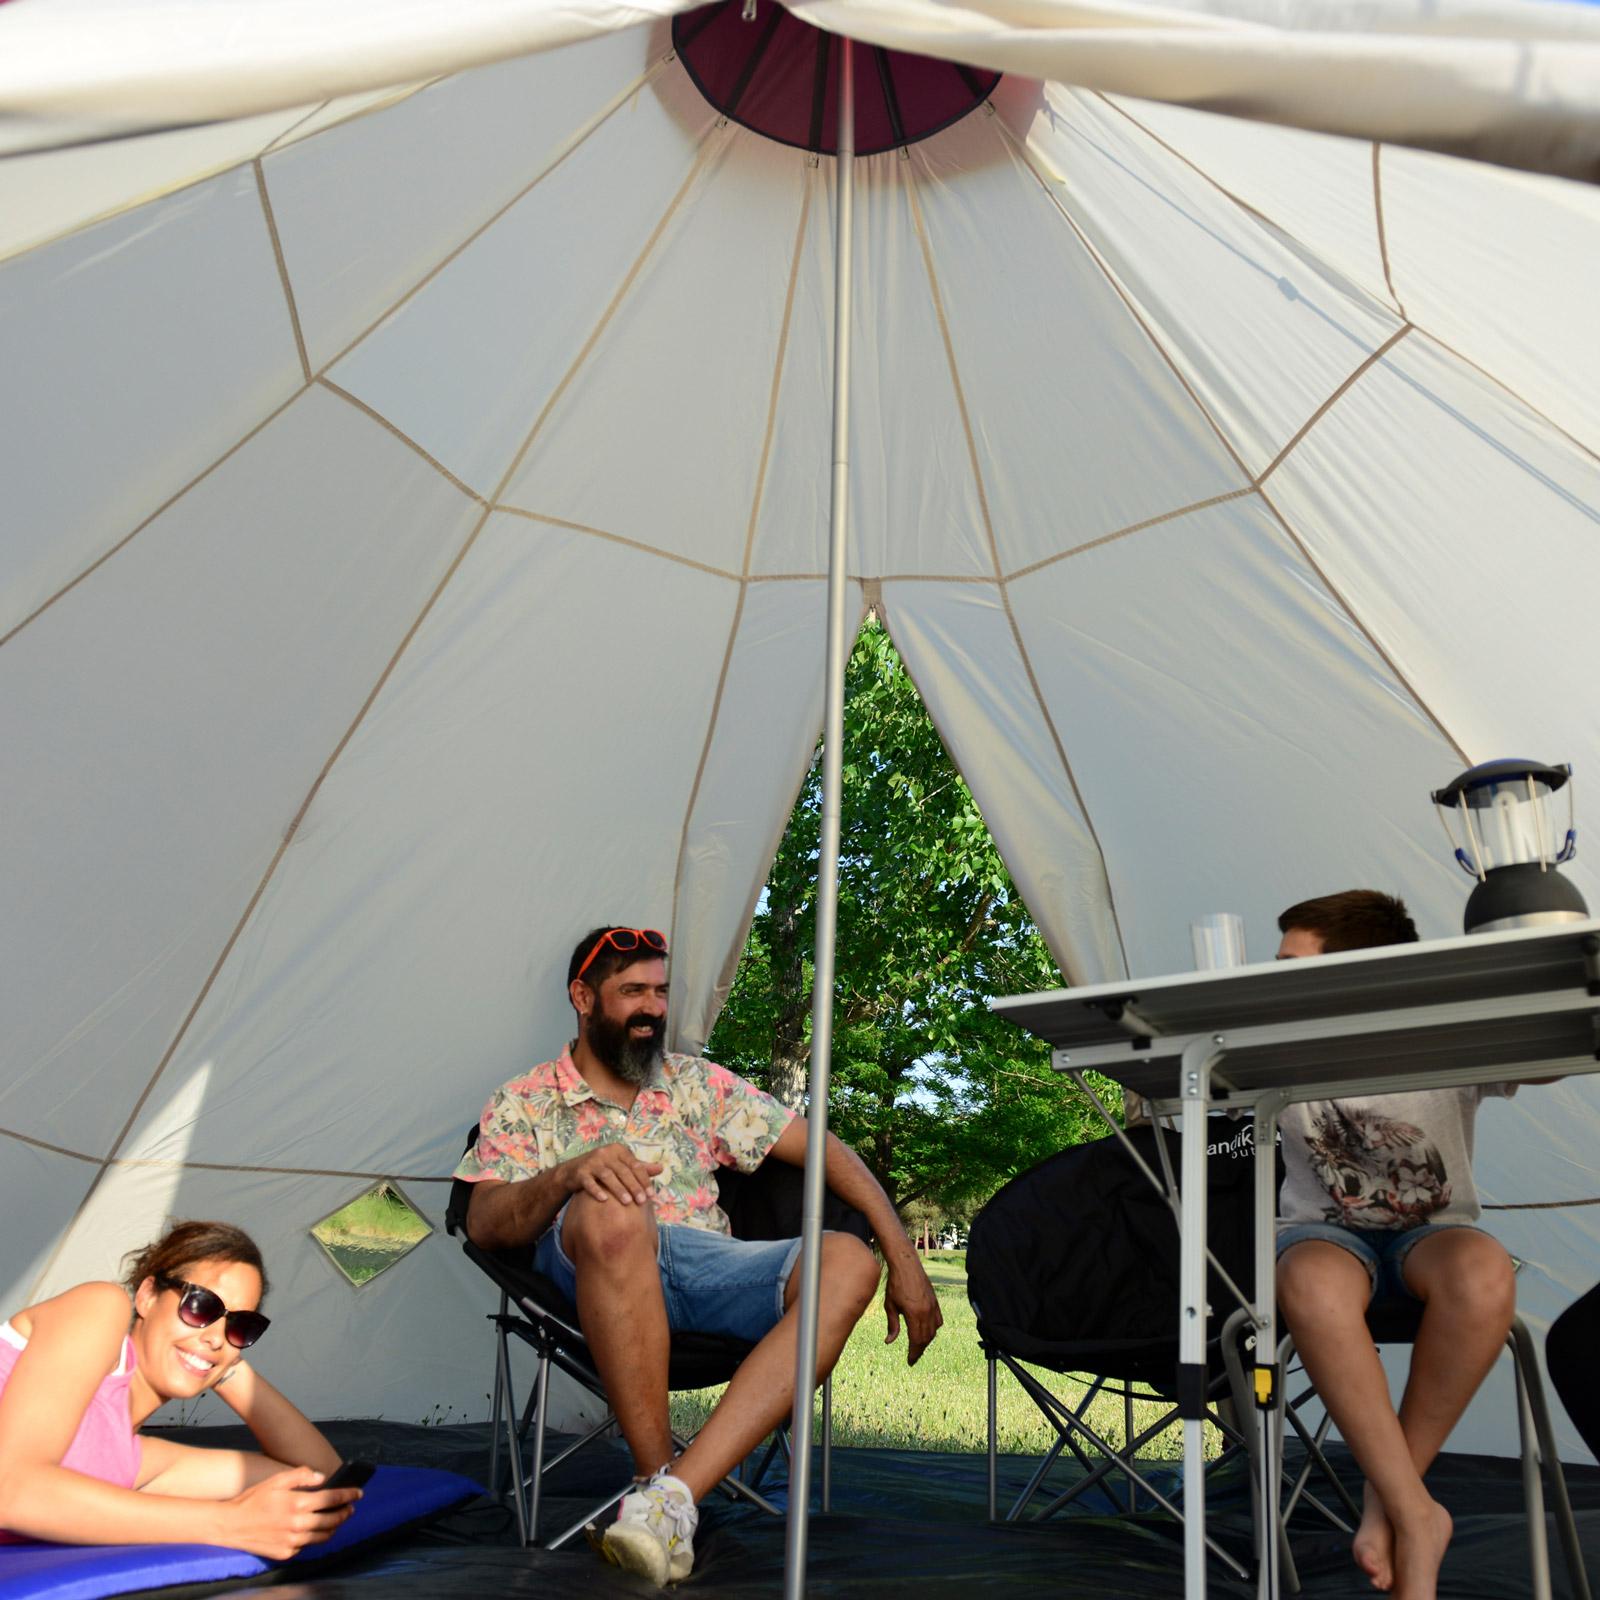 skandika-Teepee-250-Camping-Party-Festival-Tent-2-5-M-Height-3000mm-Column-New thumbnail 11